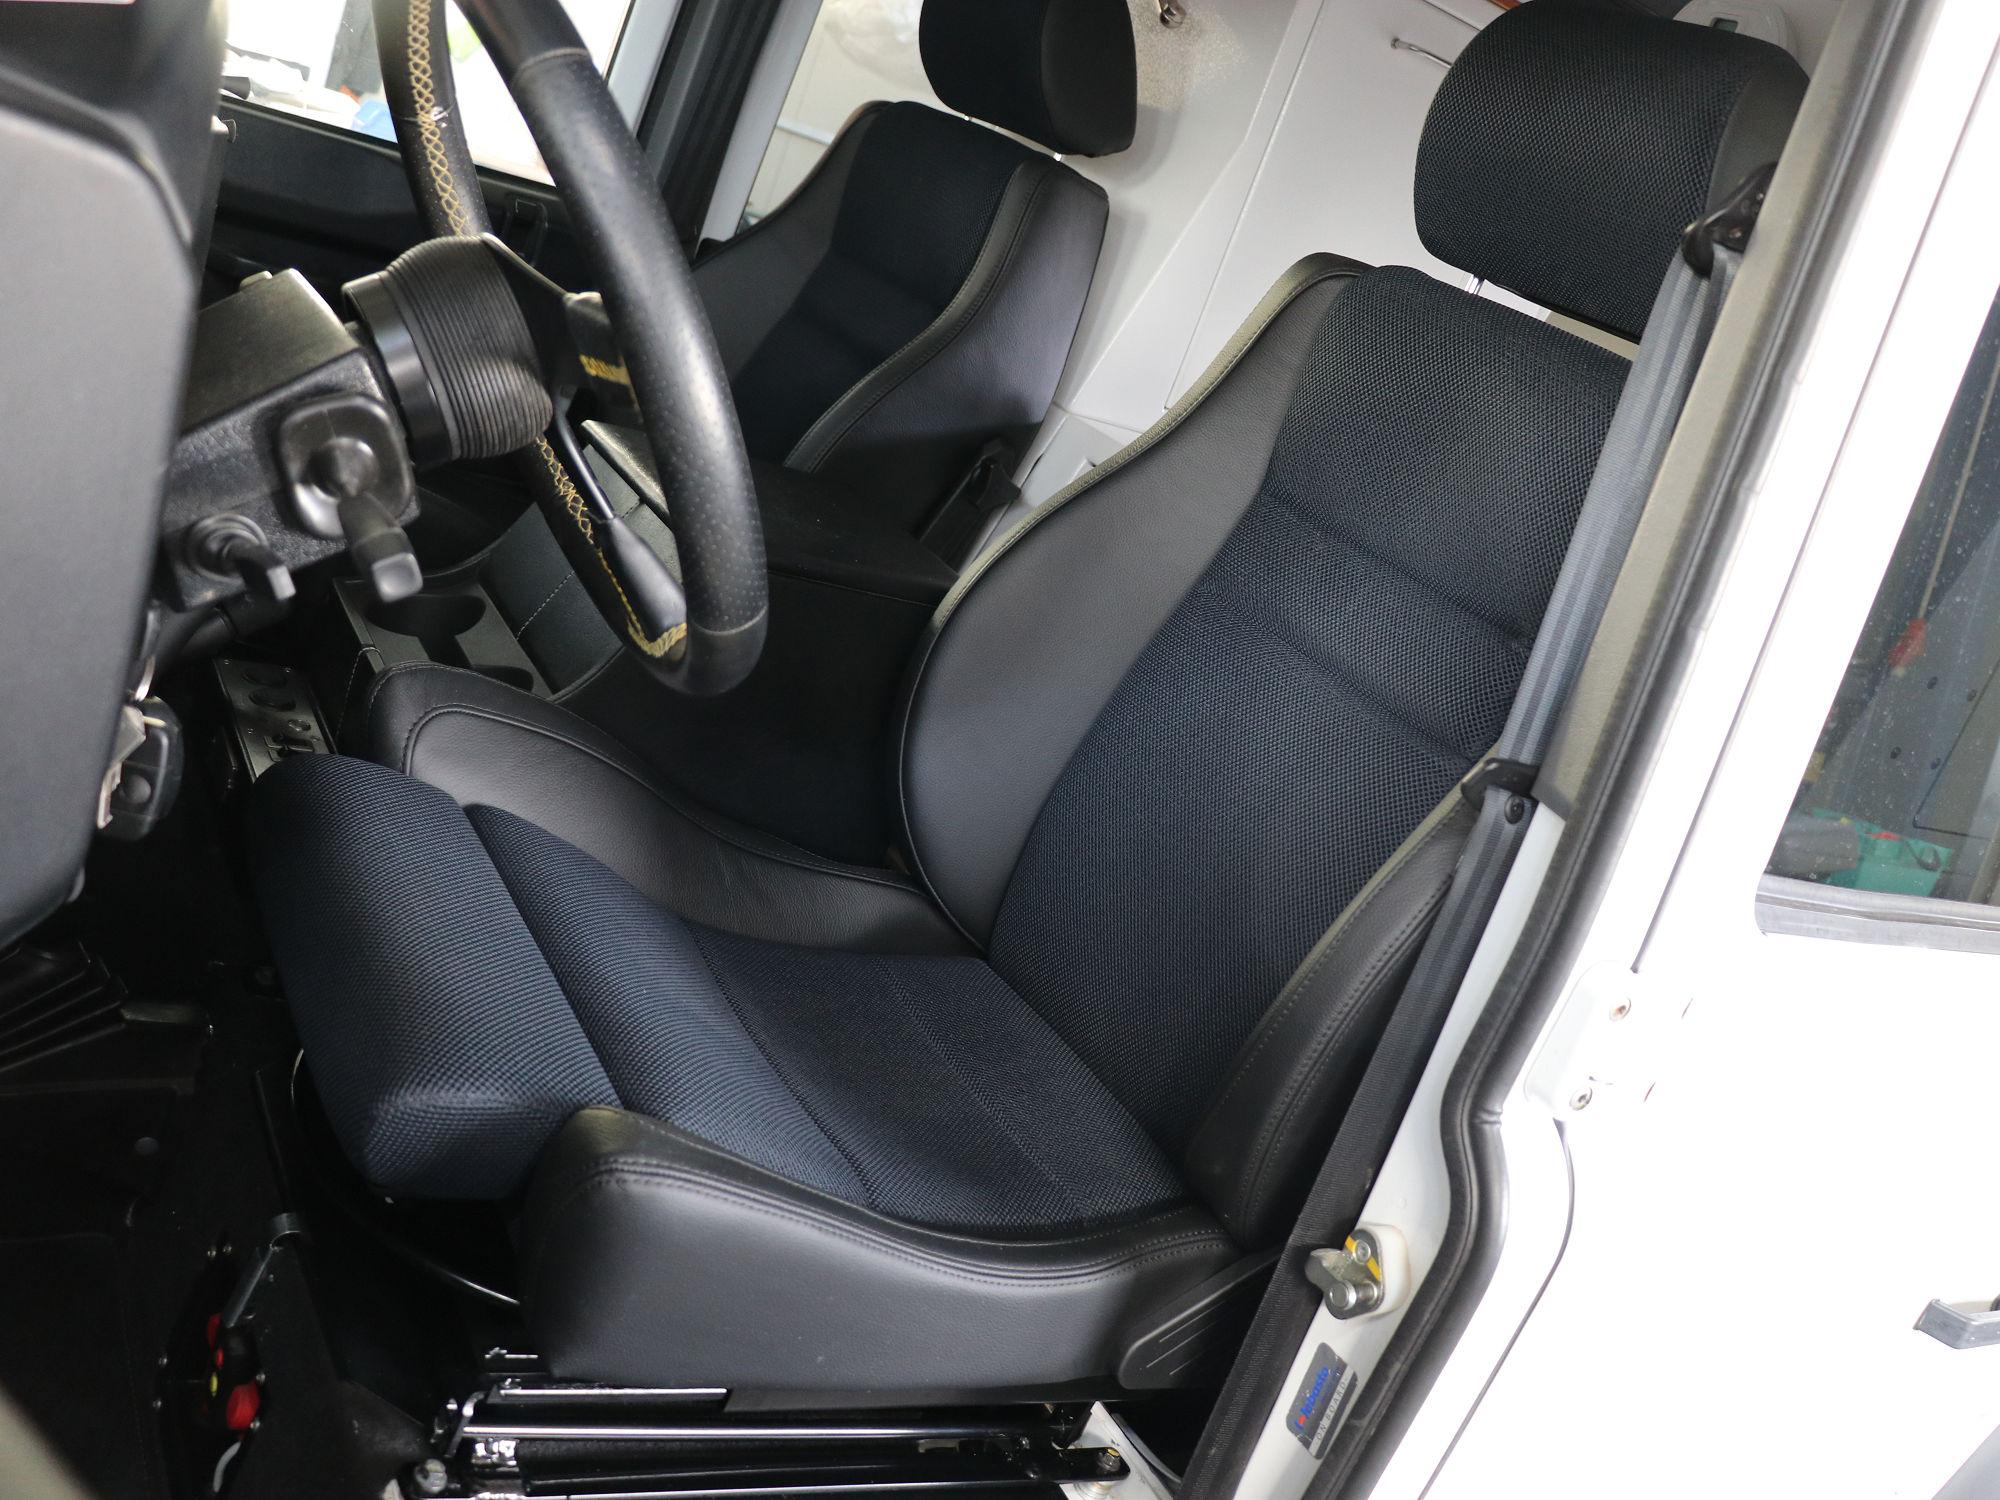 Entreq Komfortsitz Sportsitz Land Rover Defender.004